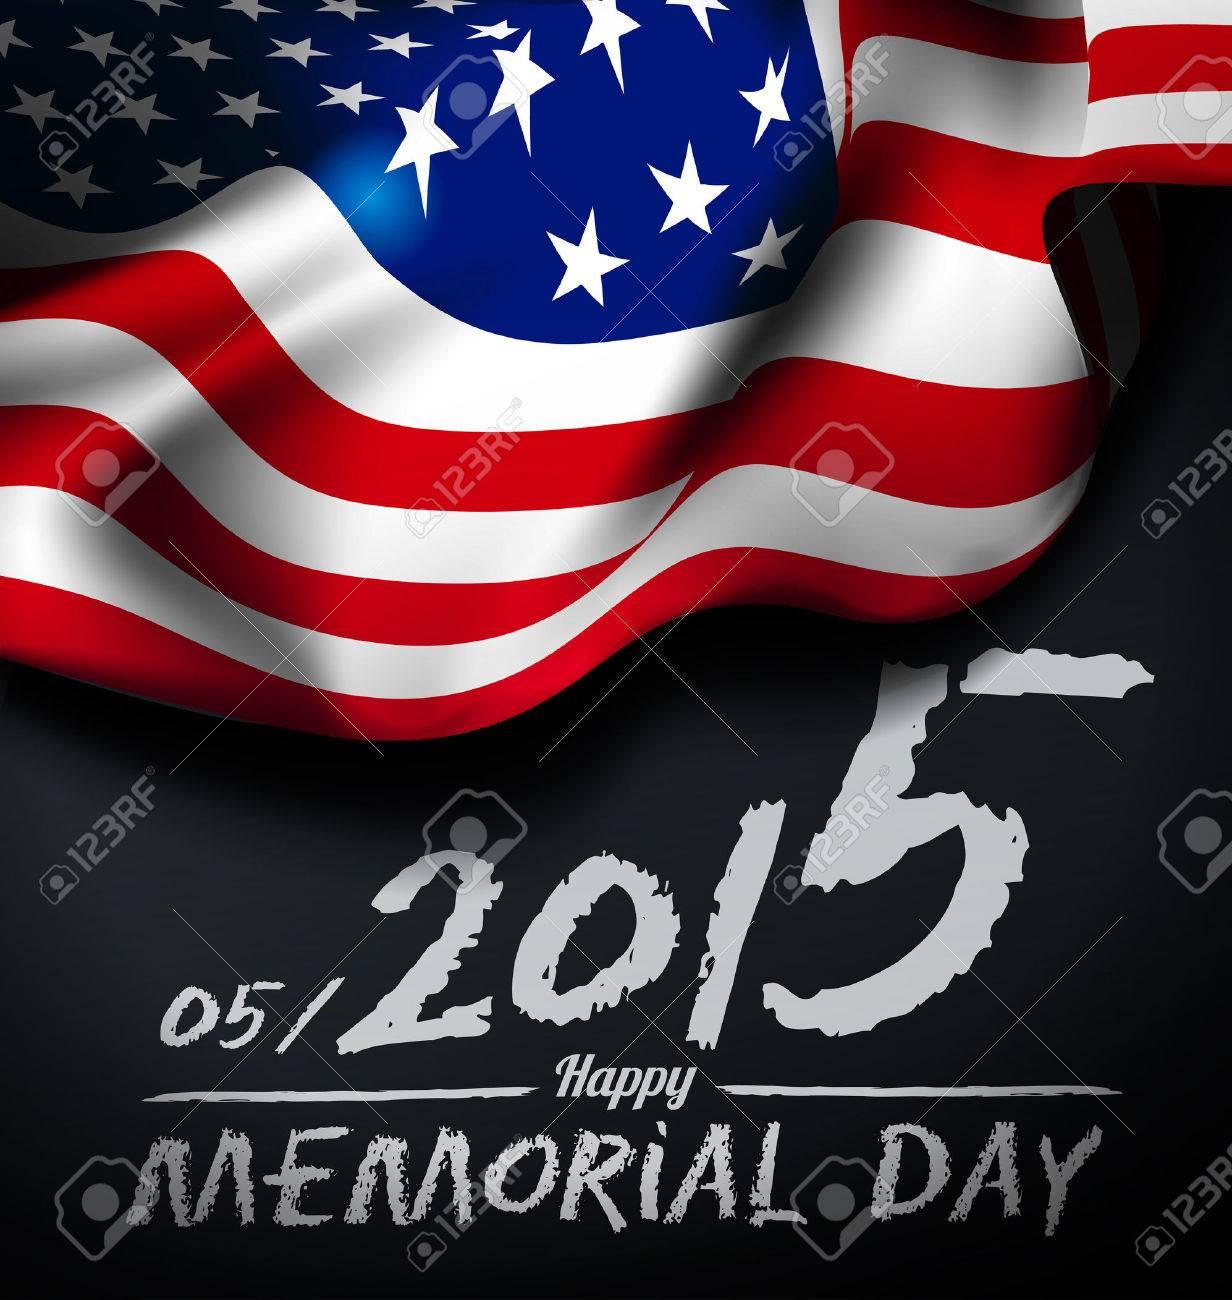 Memorial day illustration - 37398283